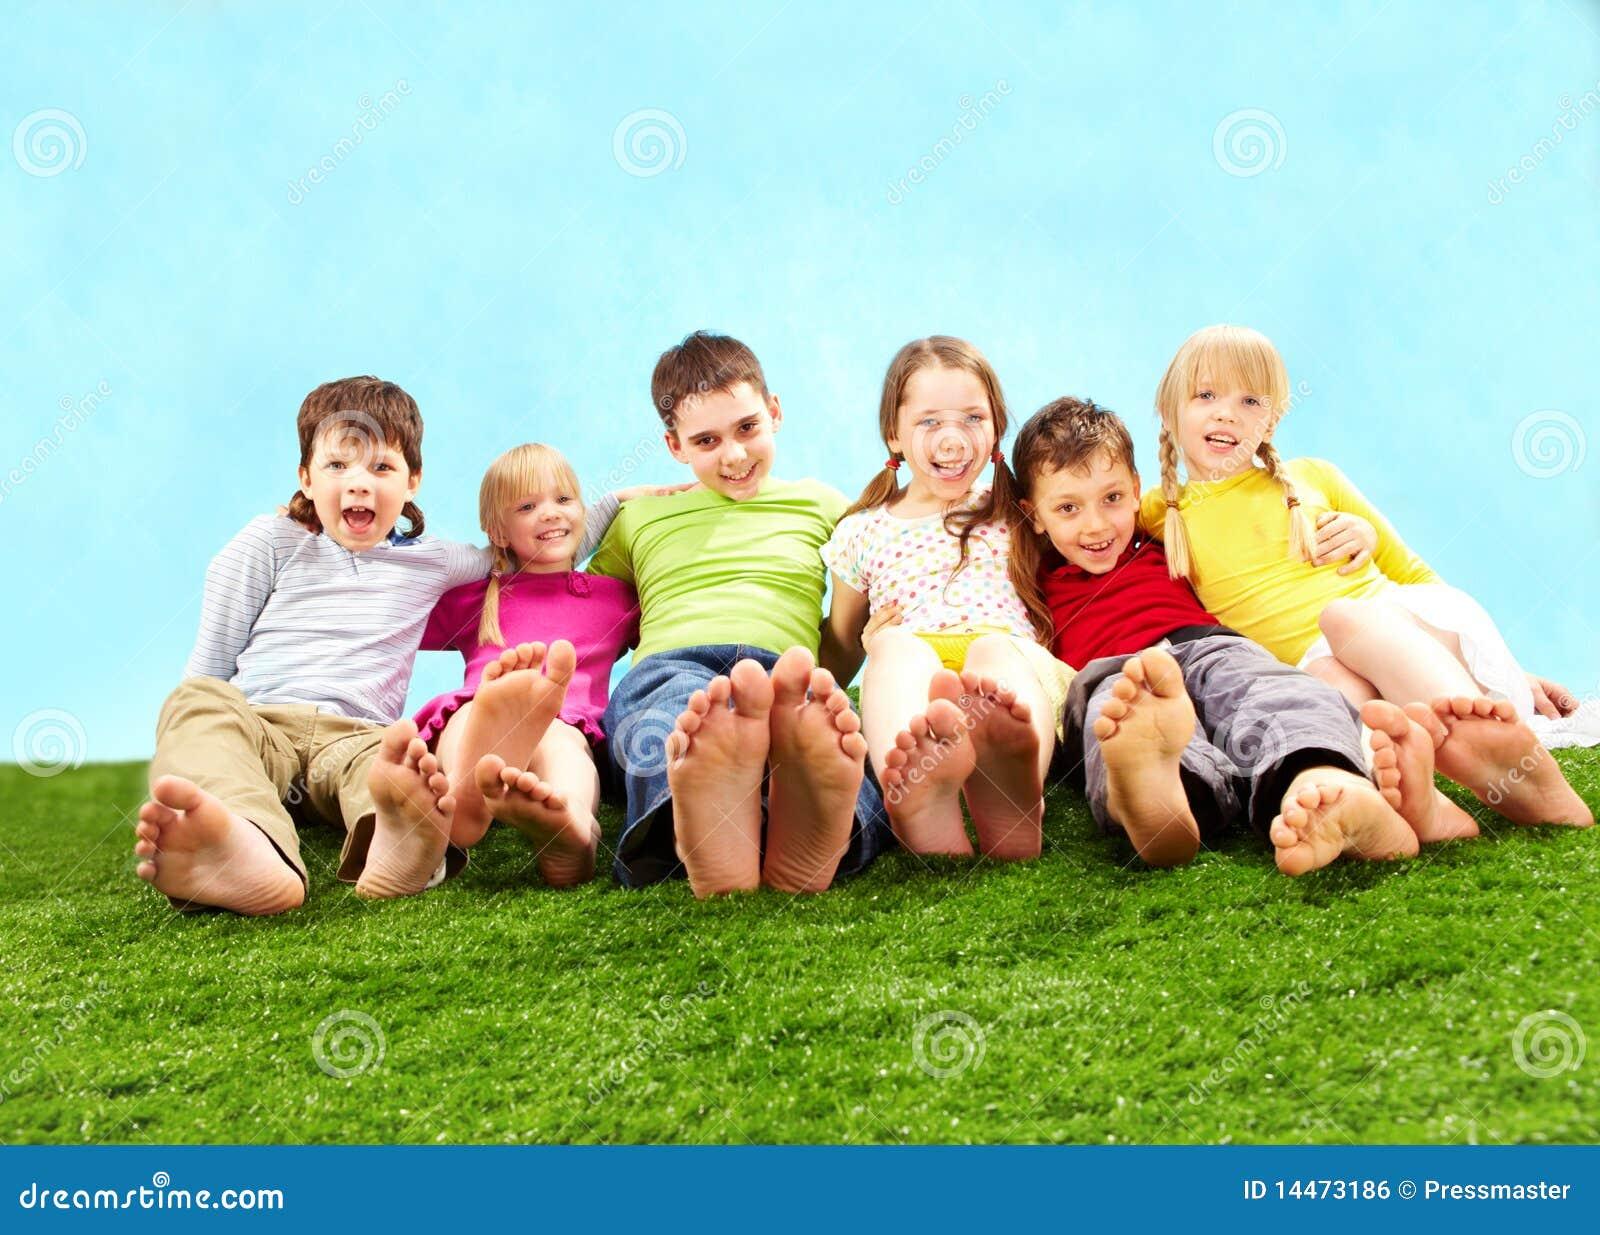 Relaxing children